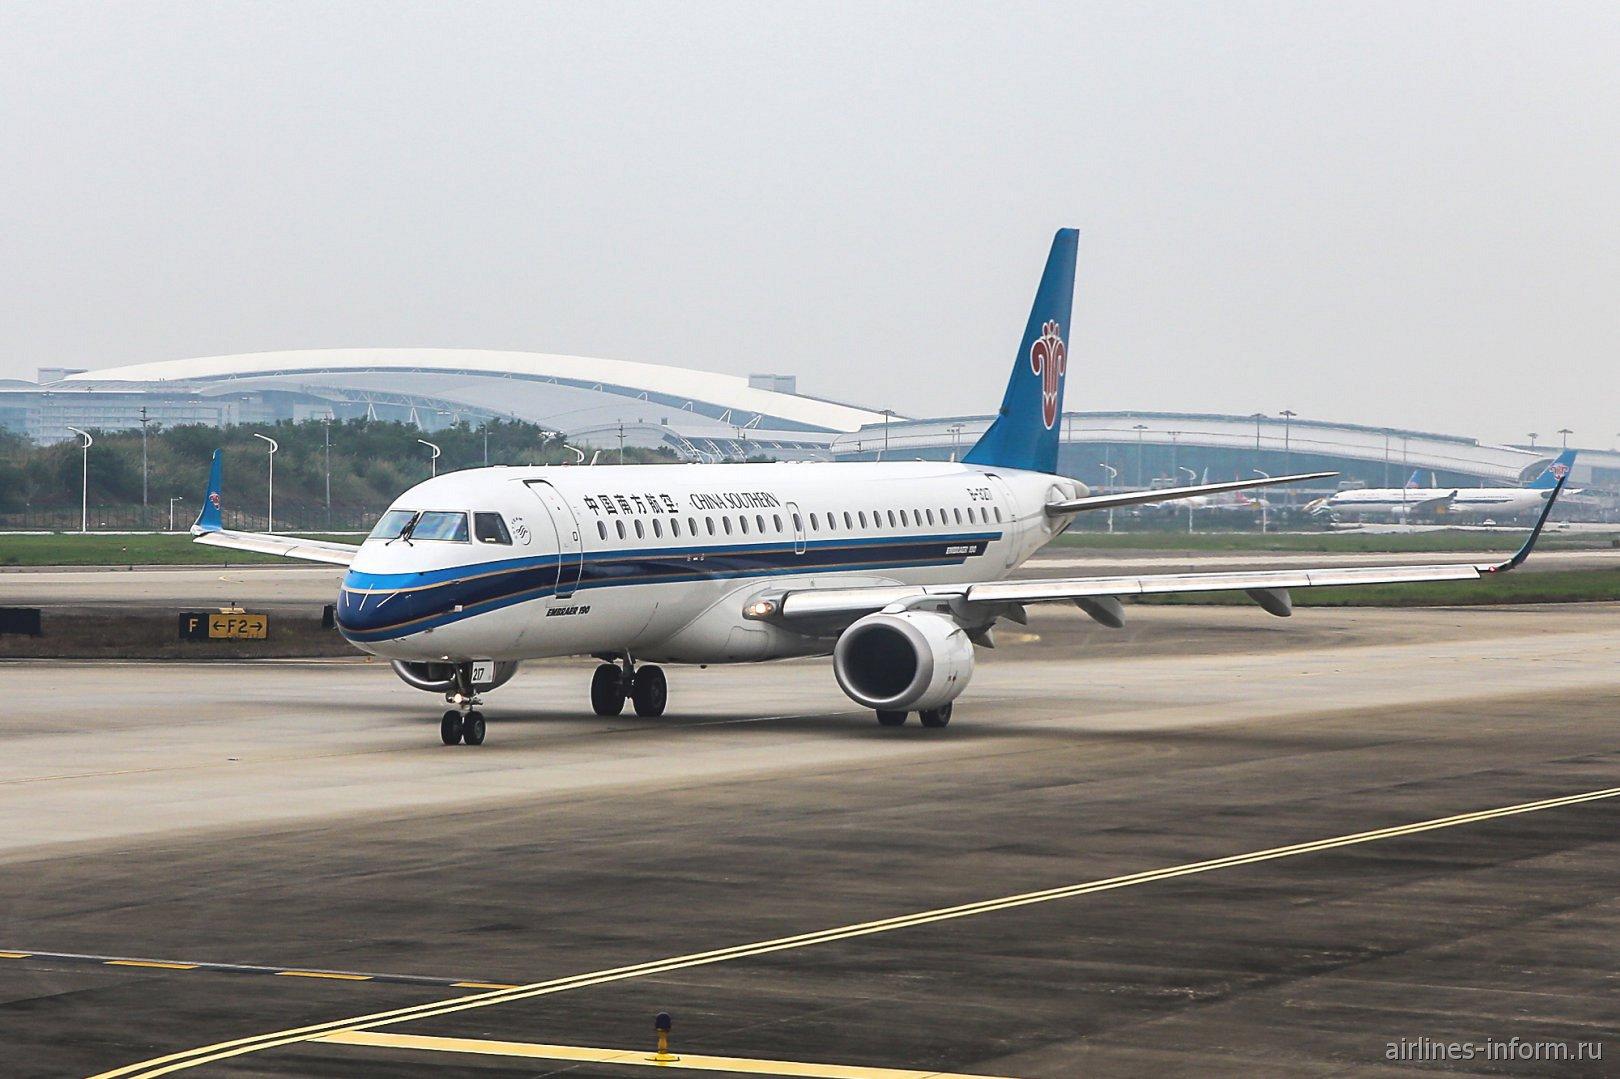 Самолет Embraer 190 авиакомпании China Southern Airlines в аэропорту Гуанчжоу